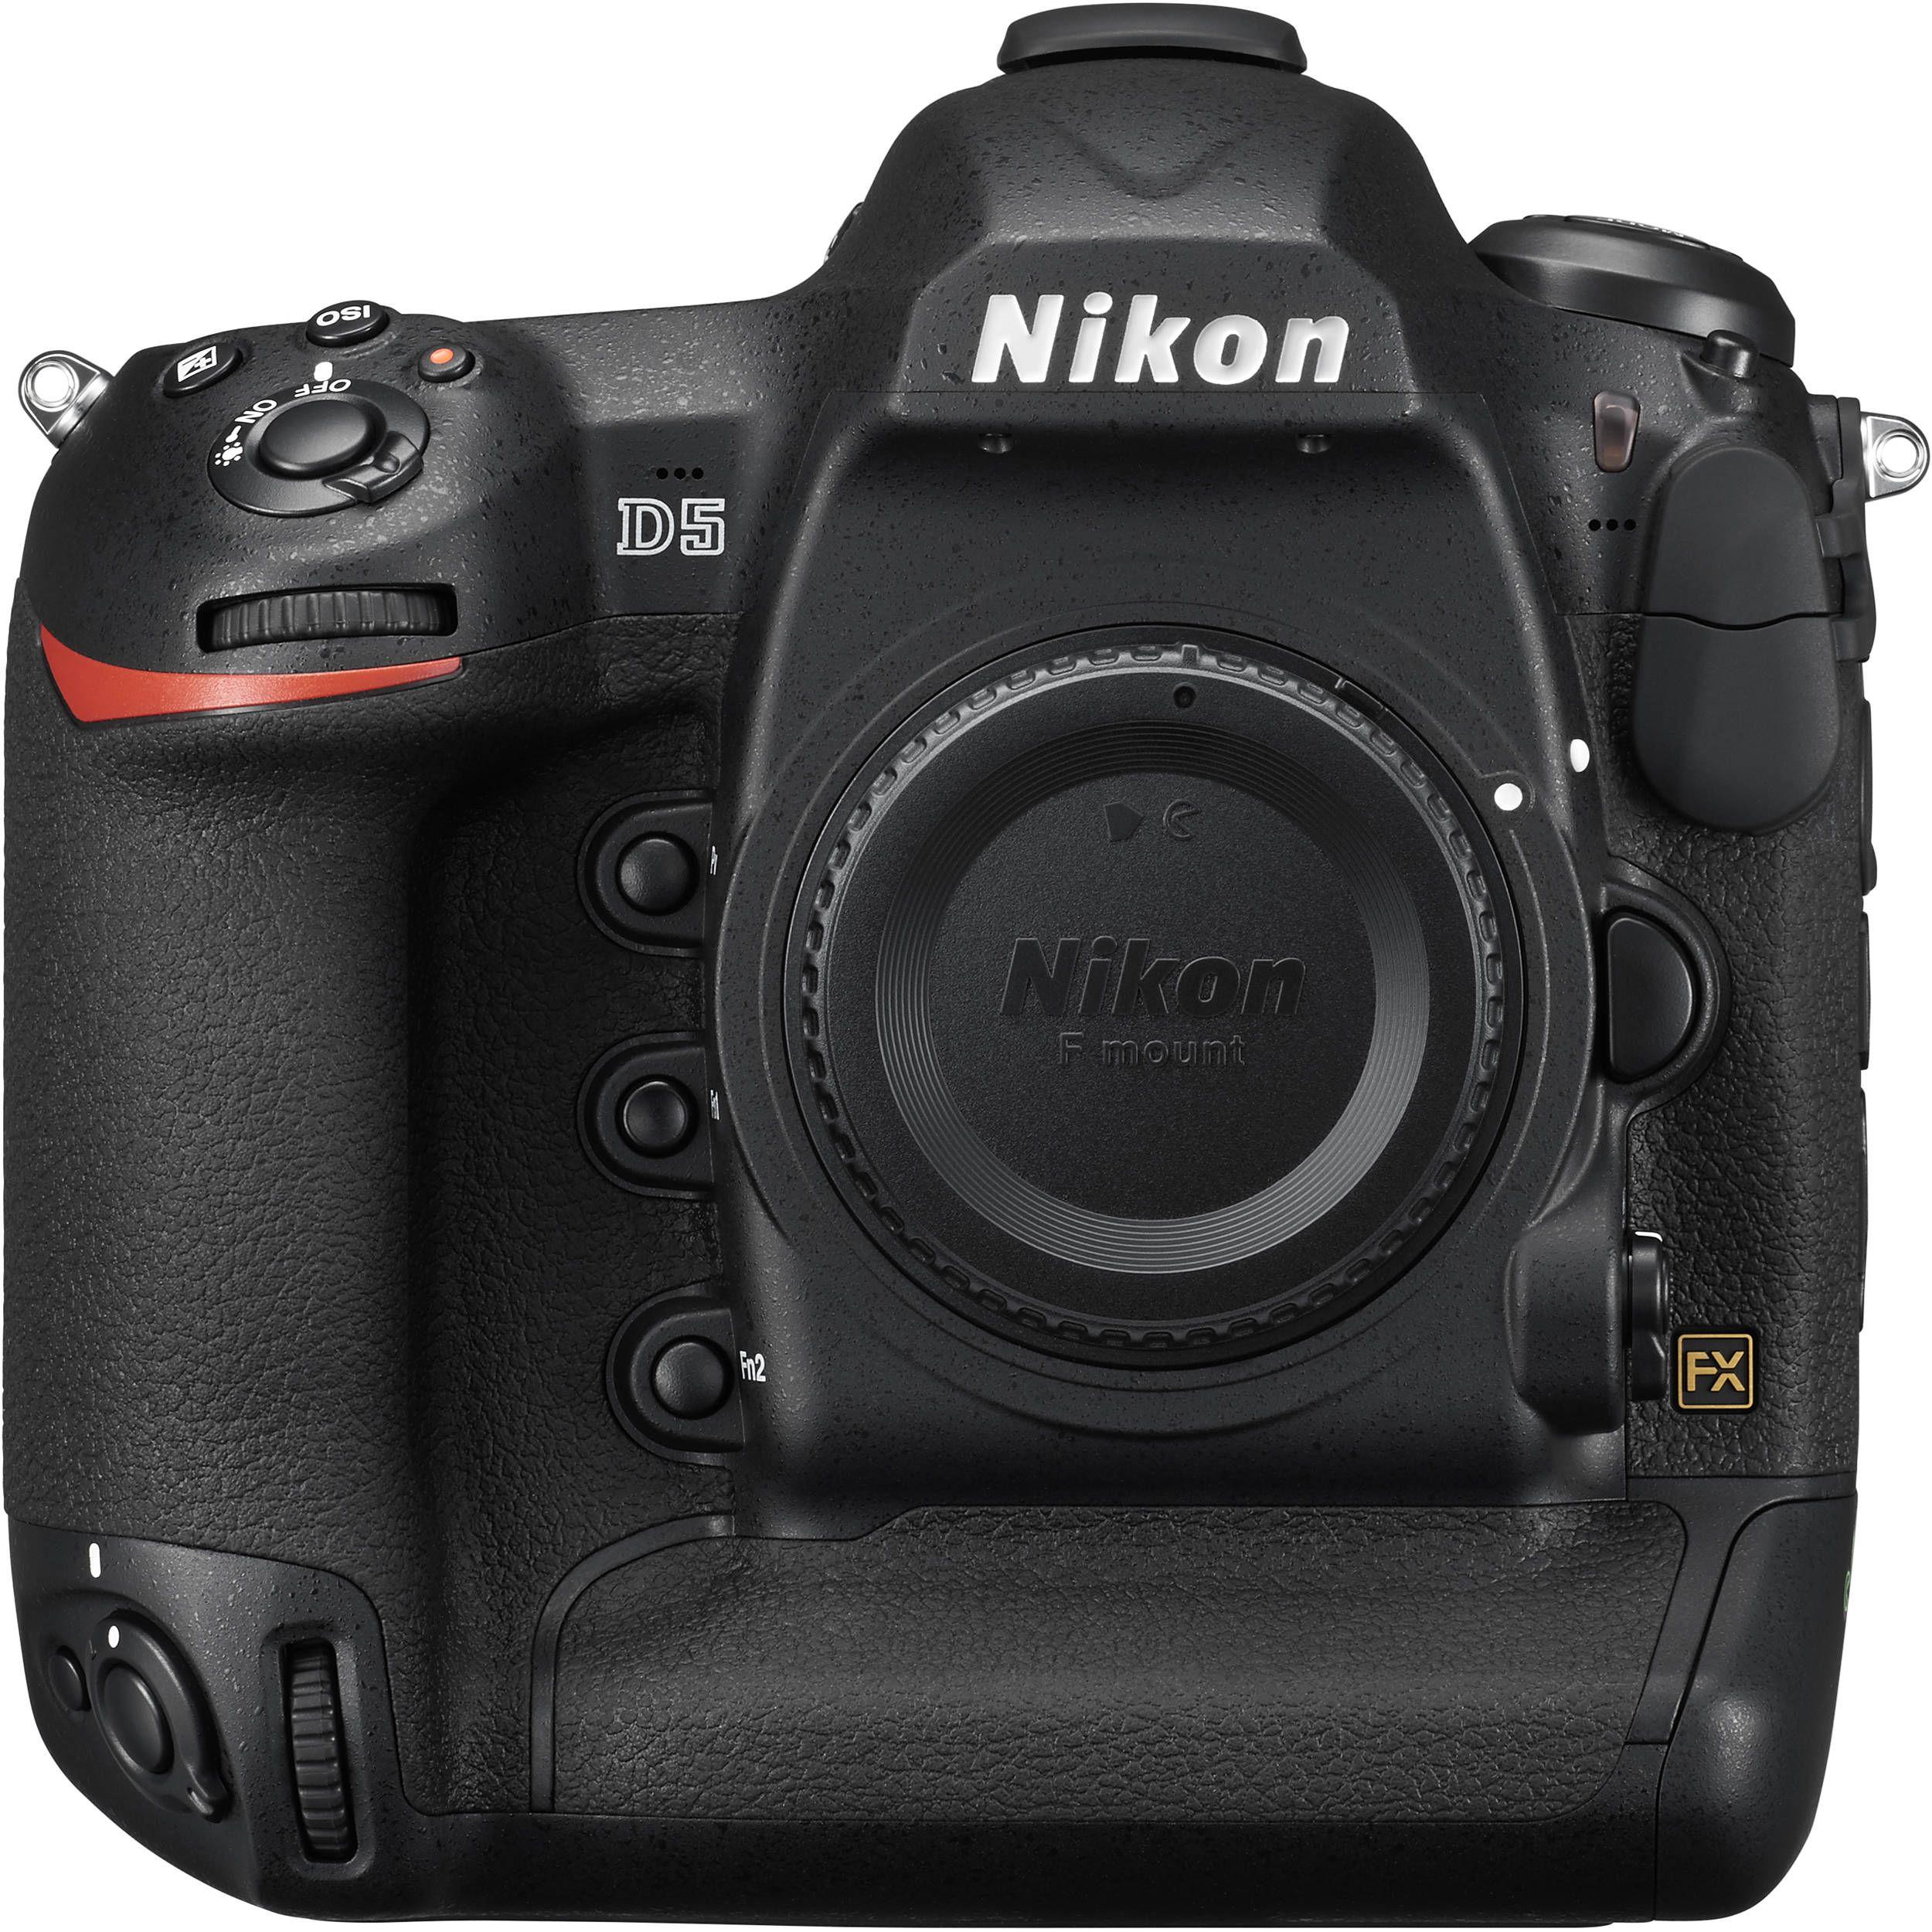 Nikon D5 Dslr Camera D5 Body Only Dual Compactflash 1558 B H Dslr Camera Nikon Digital Camera Nikon